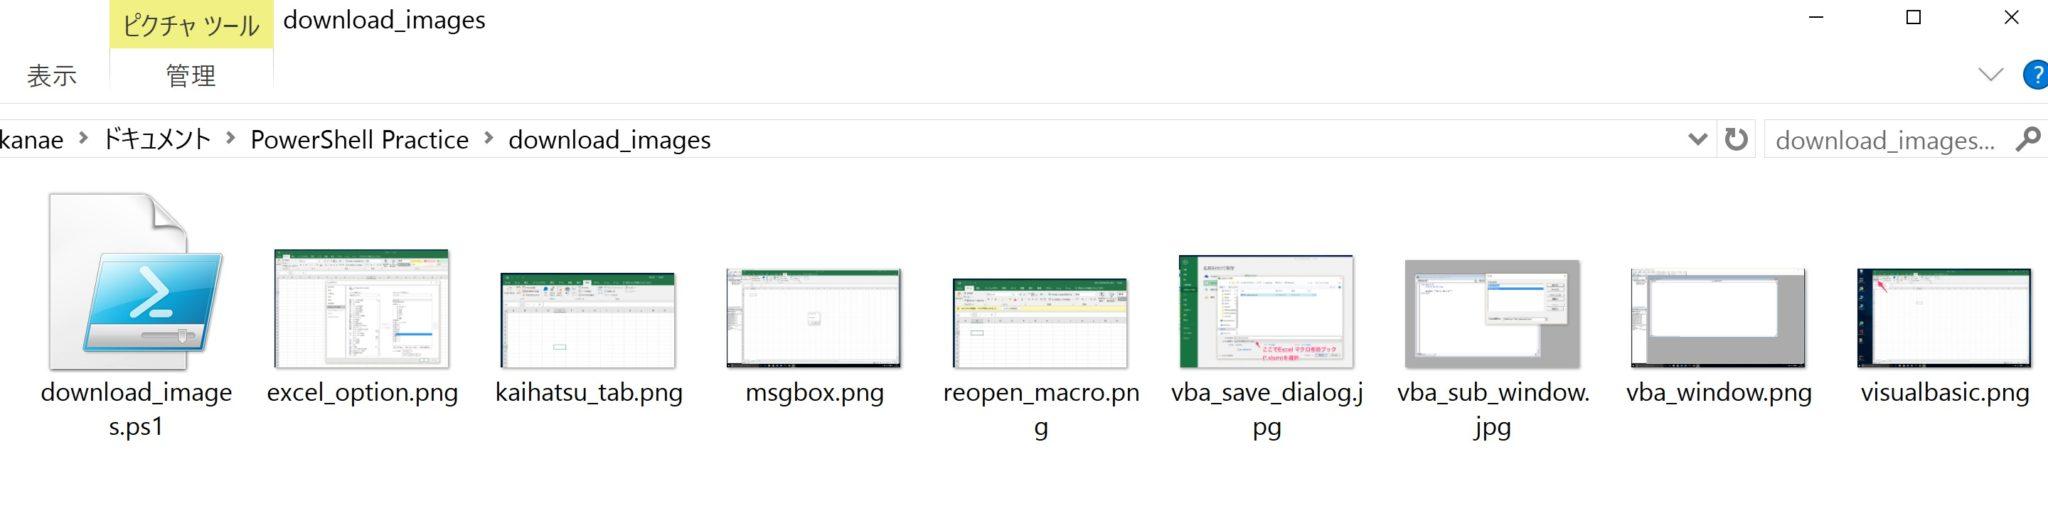 Make an image downloader [PowerShell] - Jidouka work